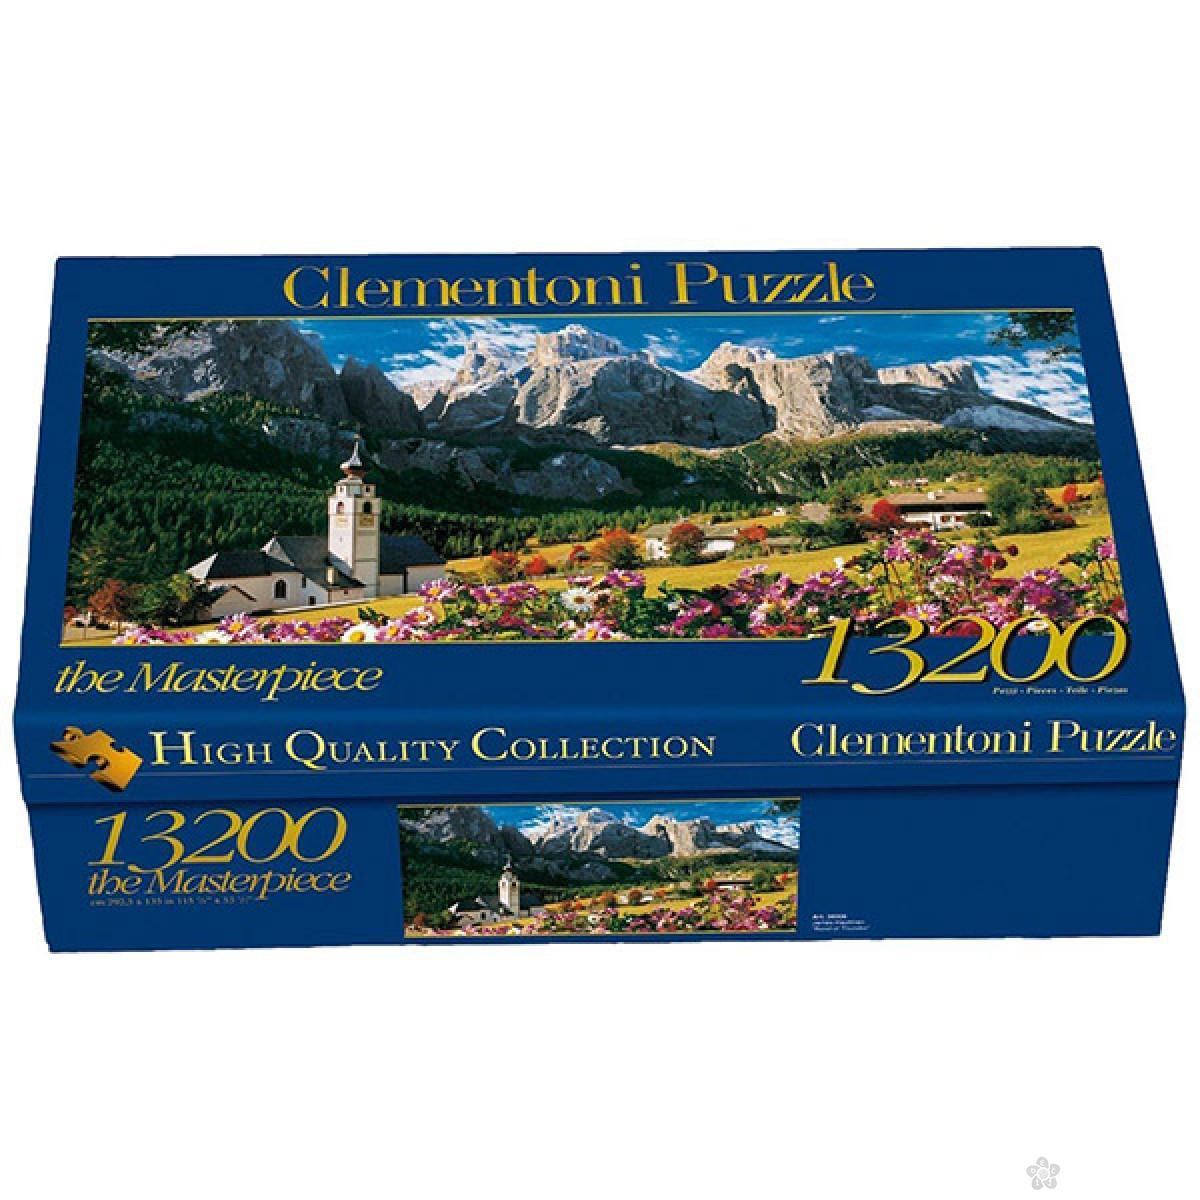 Puzzla Clementoni 13200 pcs Dolomites 38007